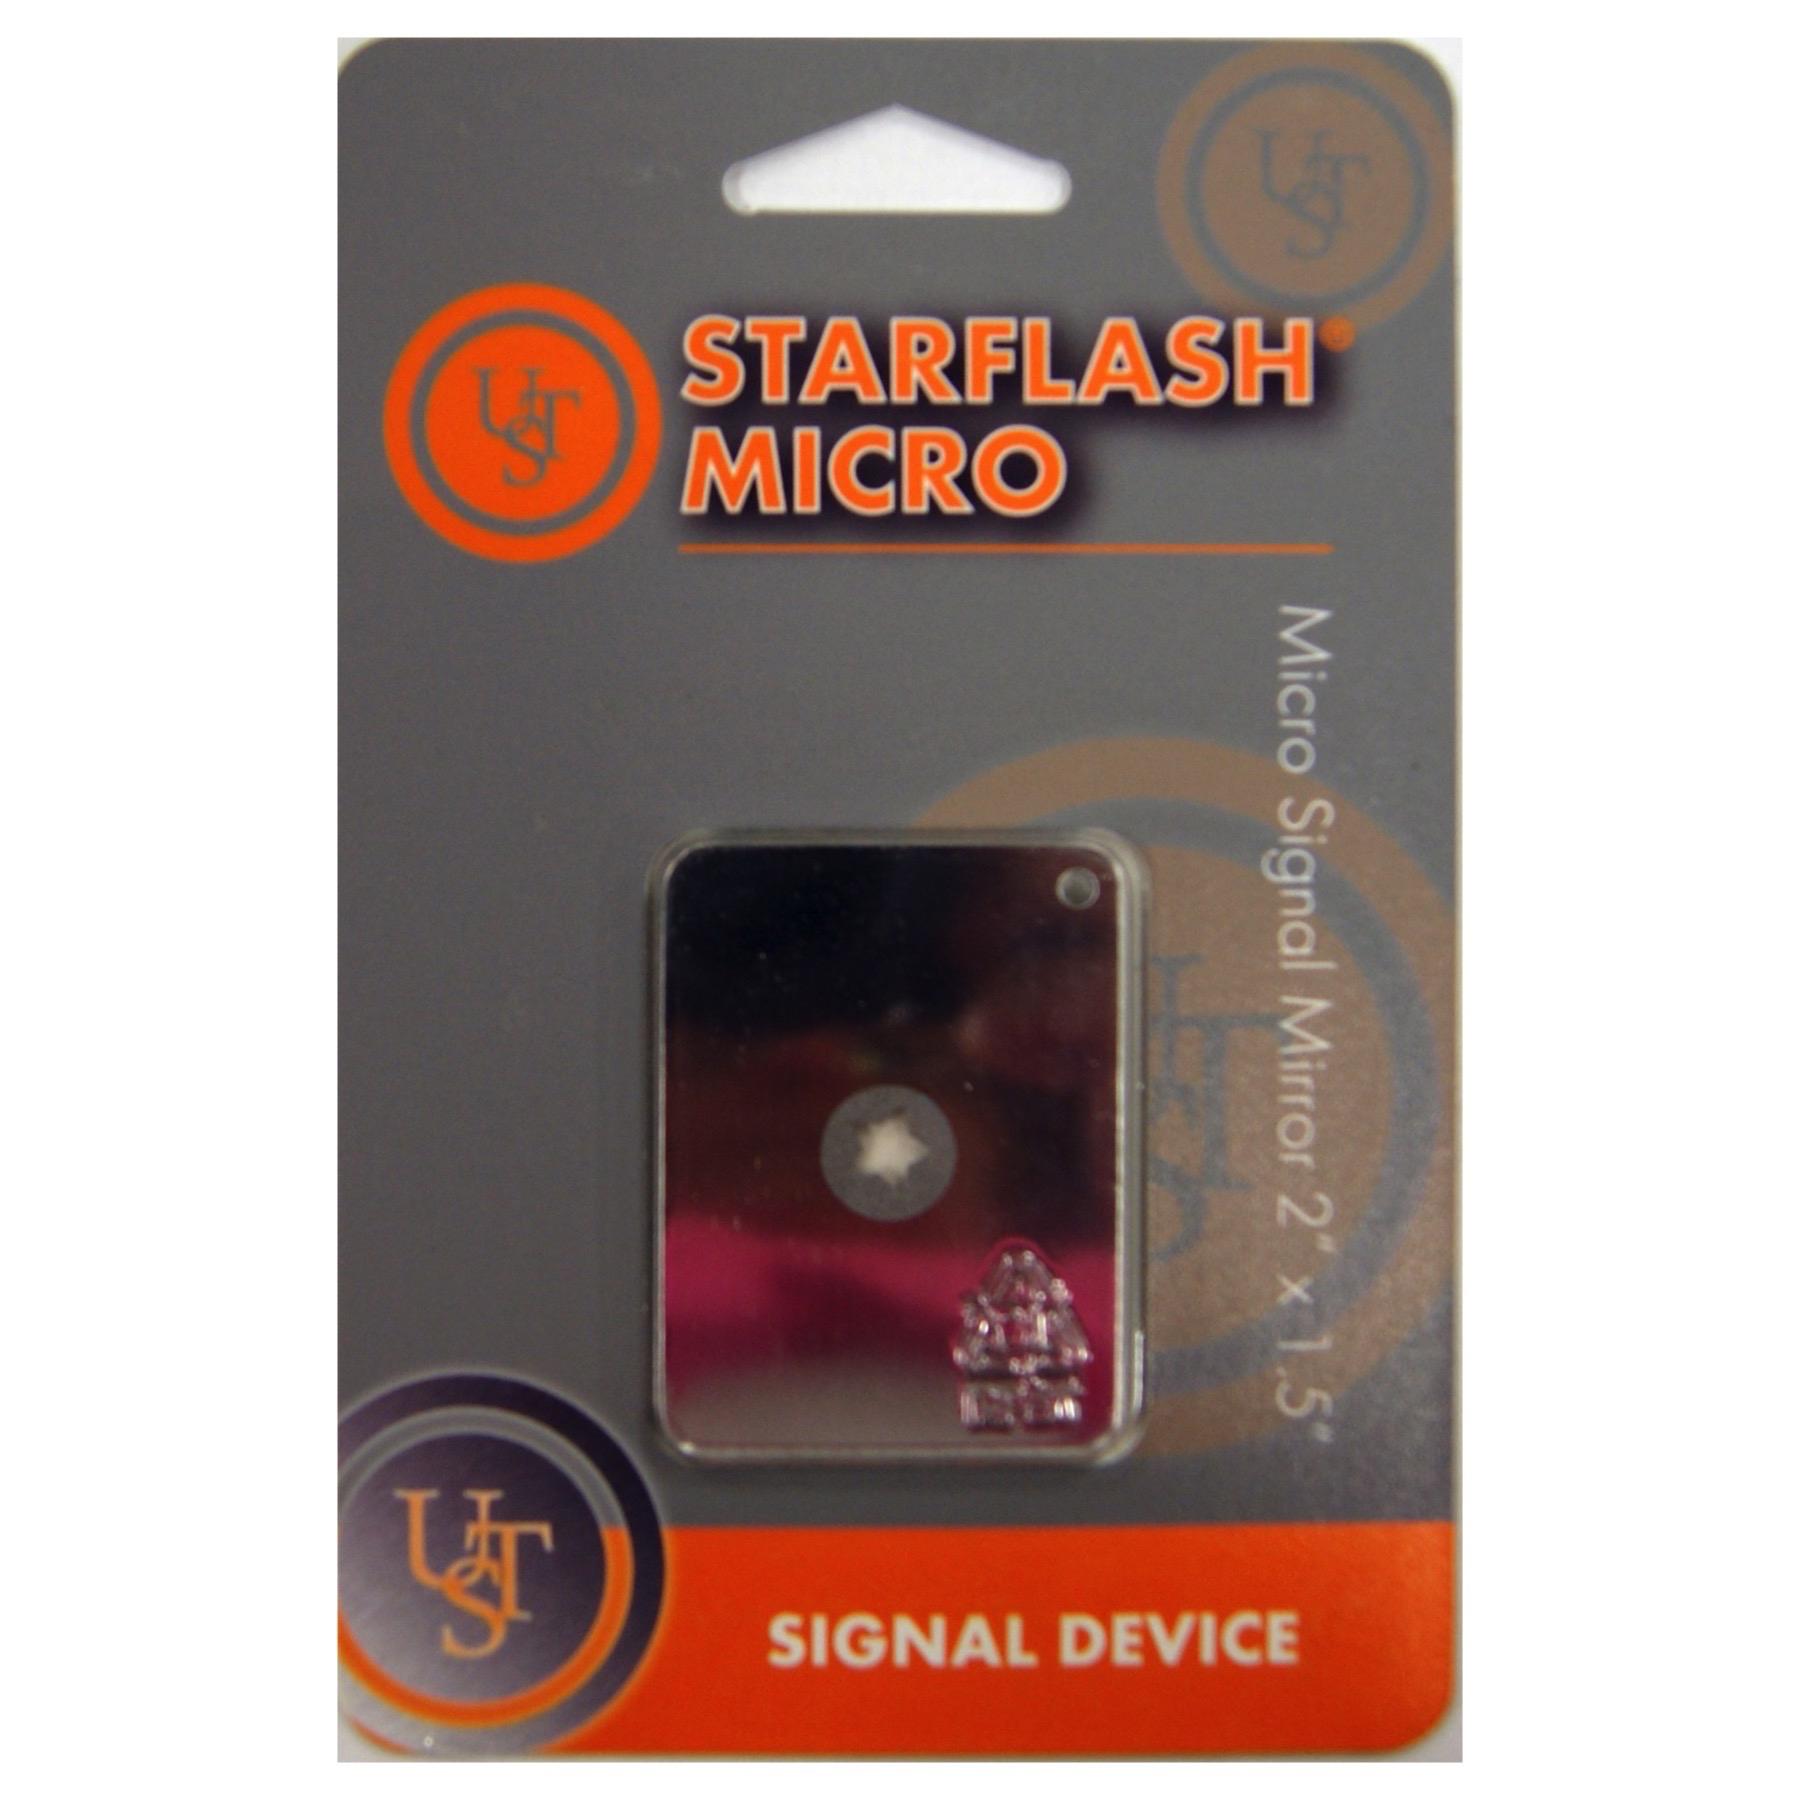 Ultimate Survival Technologies Starflash Micro Signal